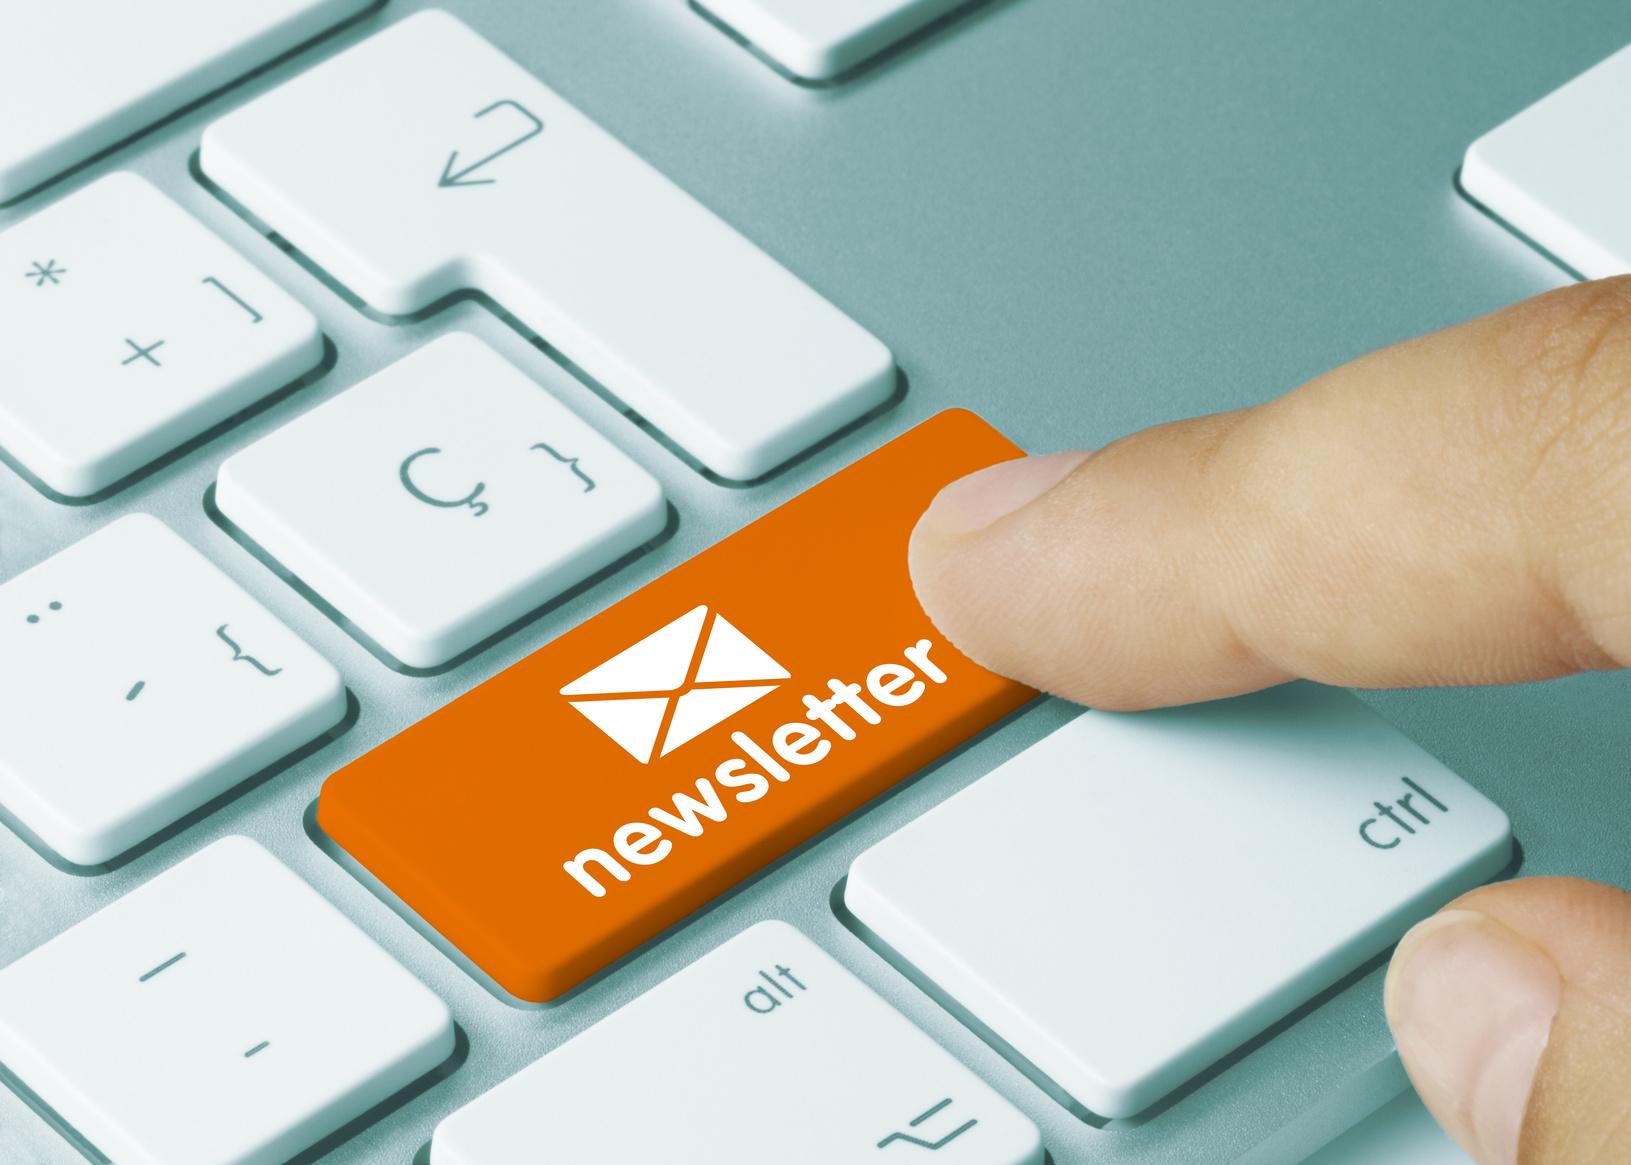 Susbríbete a nuestra newsletter